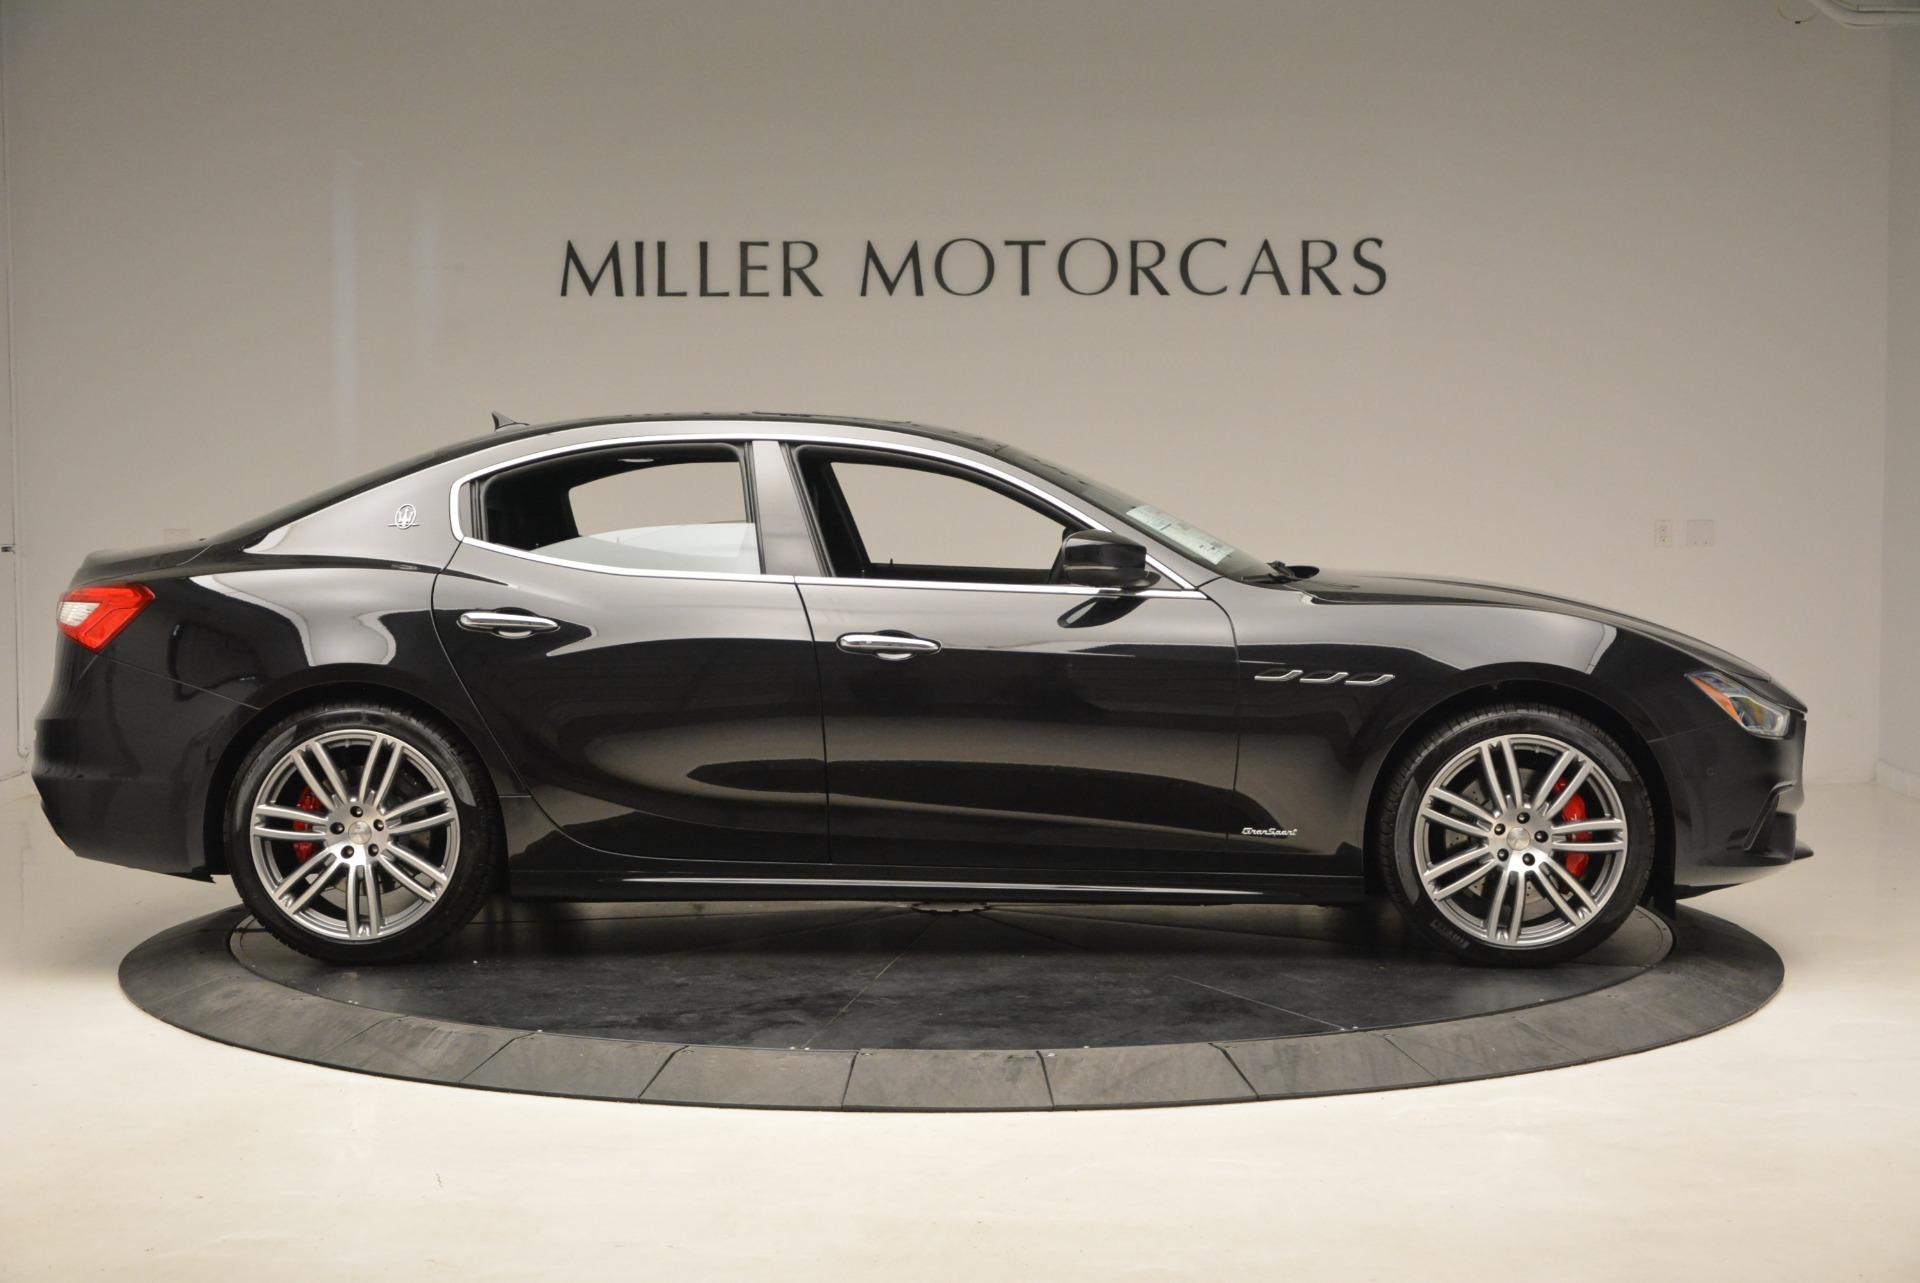 New 2018 Maserati Ghibli S Q4 Gransport For Sale In Westport, CT 2036_p9